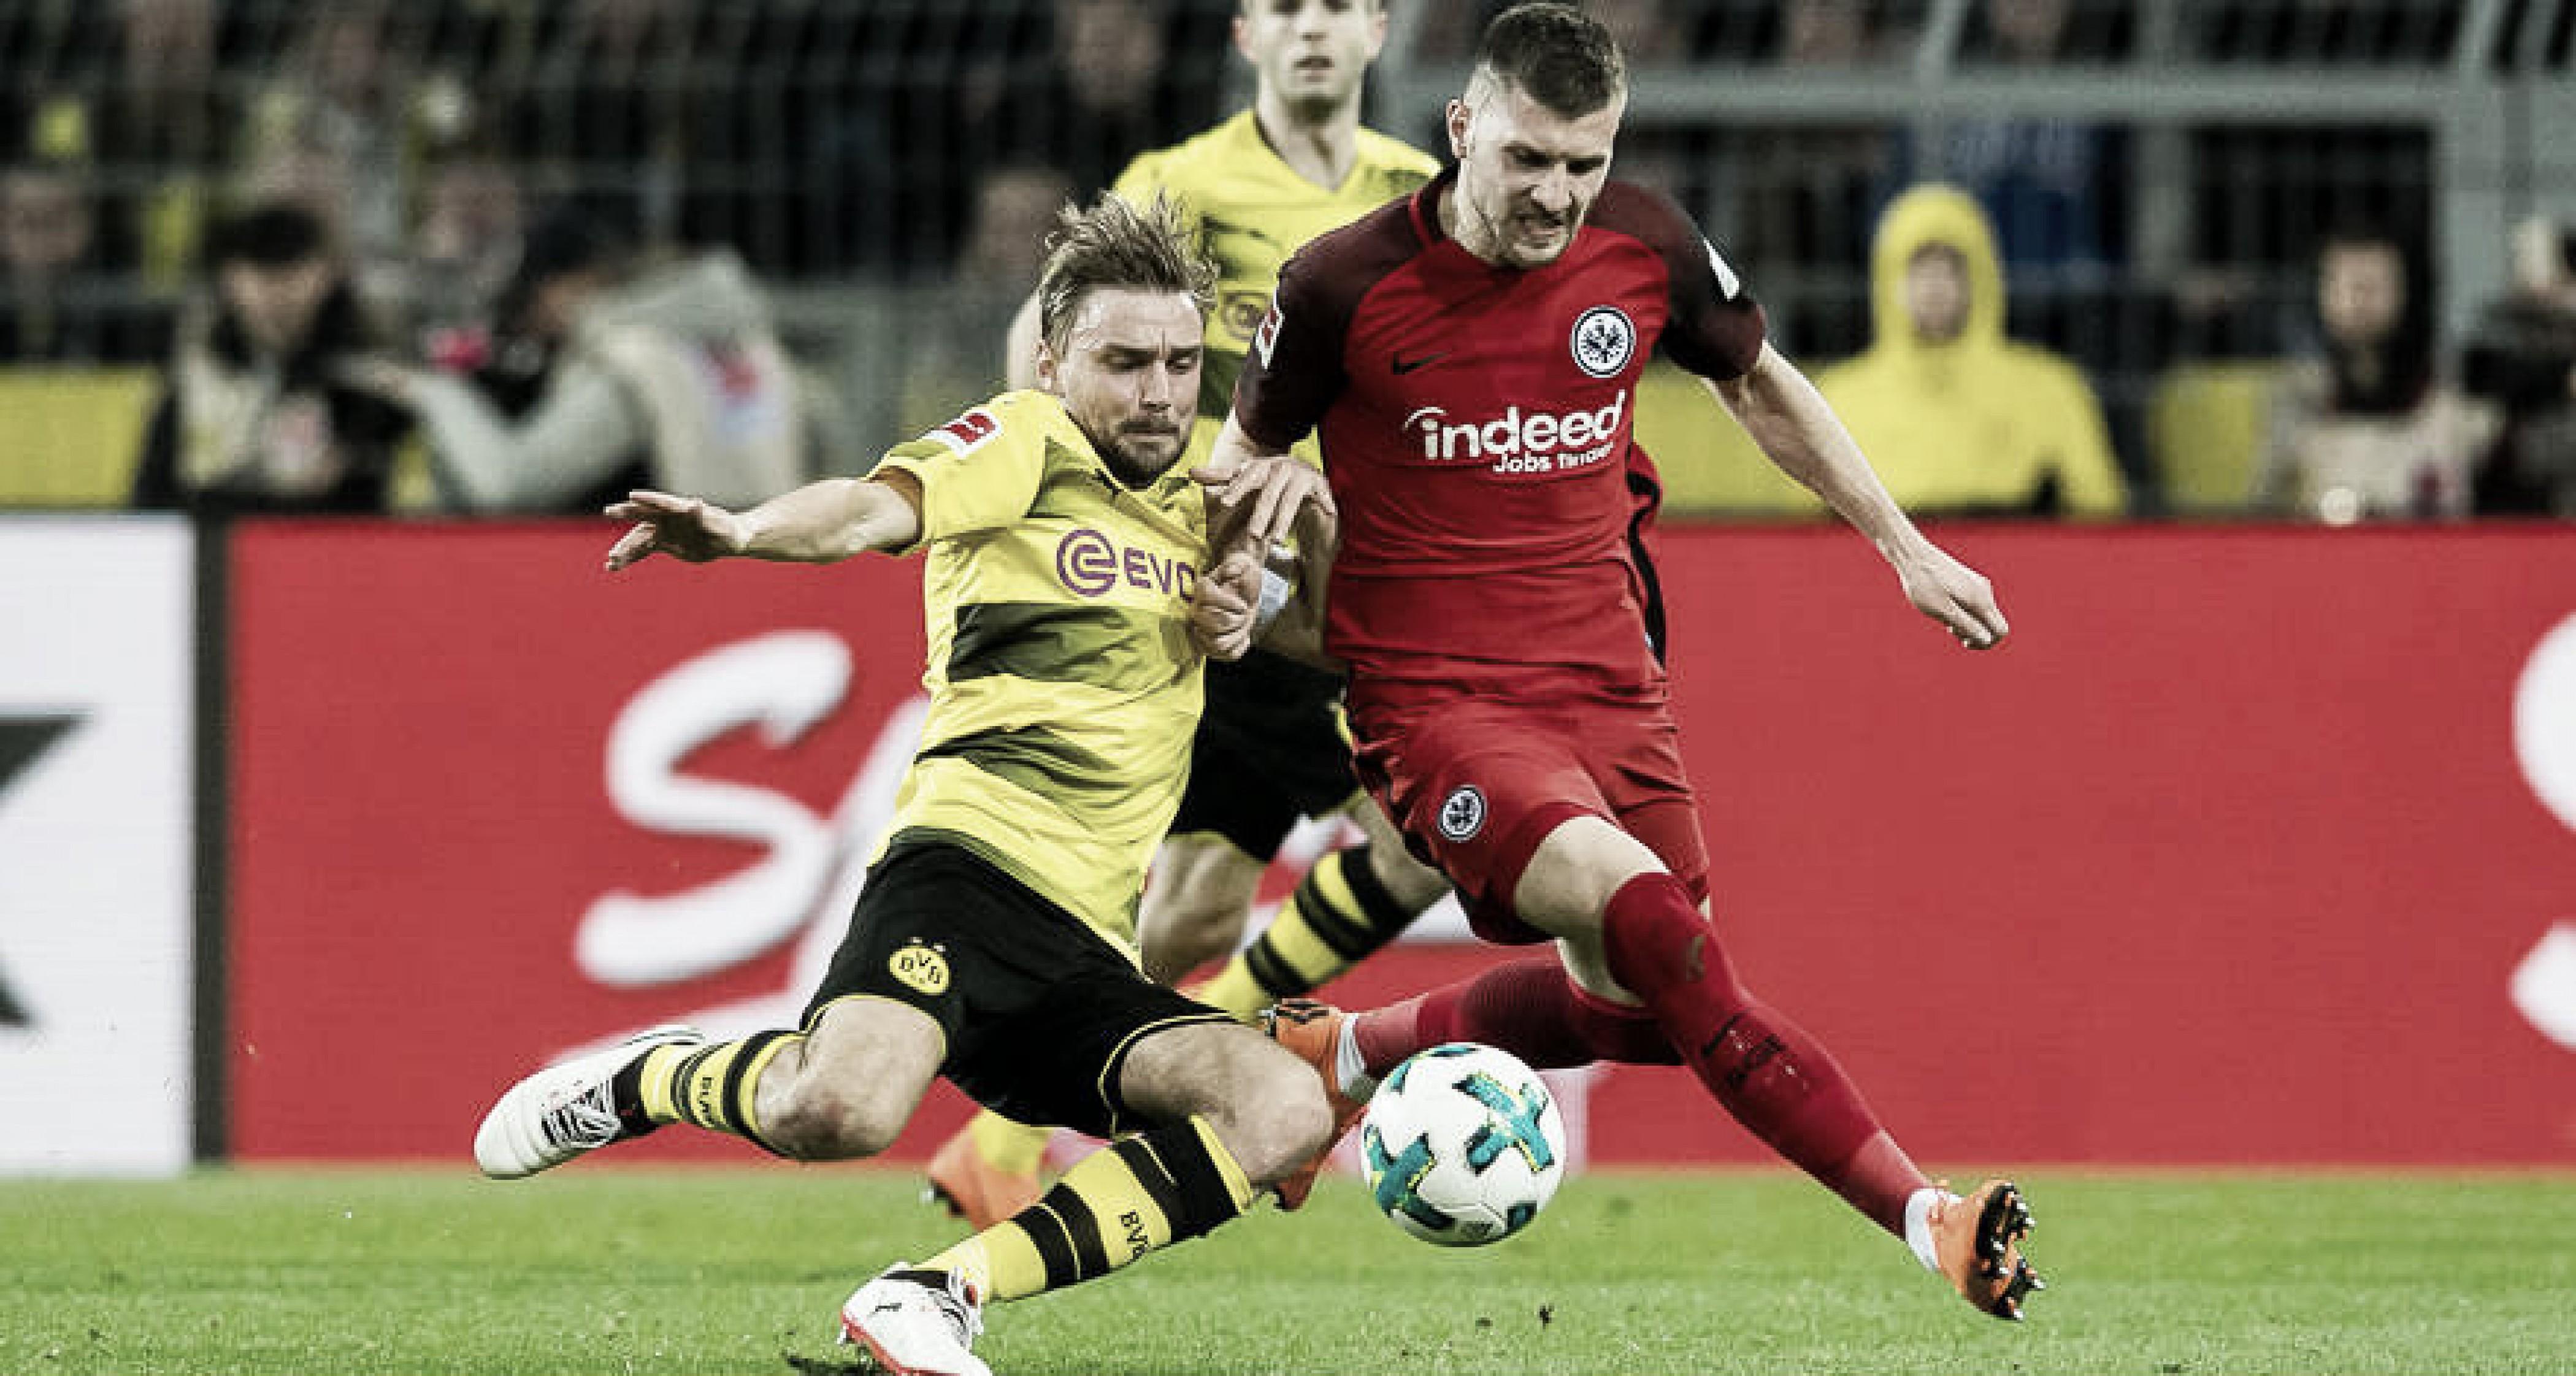 Image Result For Eintracht Frankfurt Vs Borussia Dortmund Online En Vivo